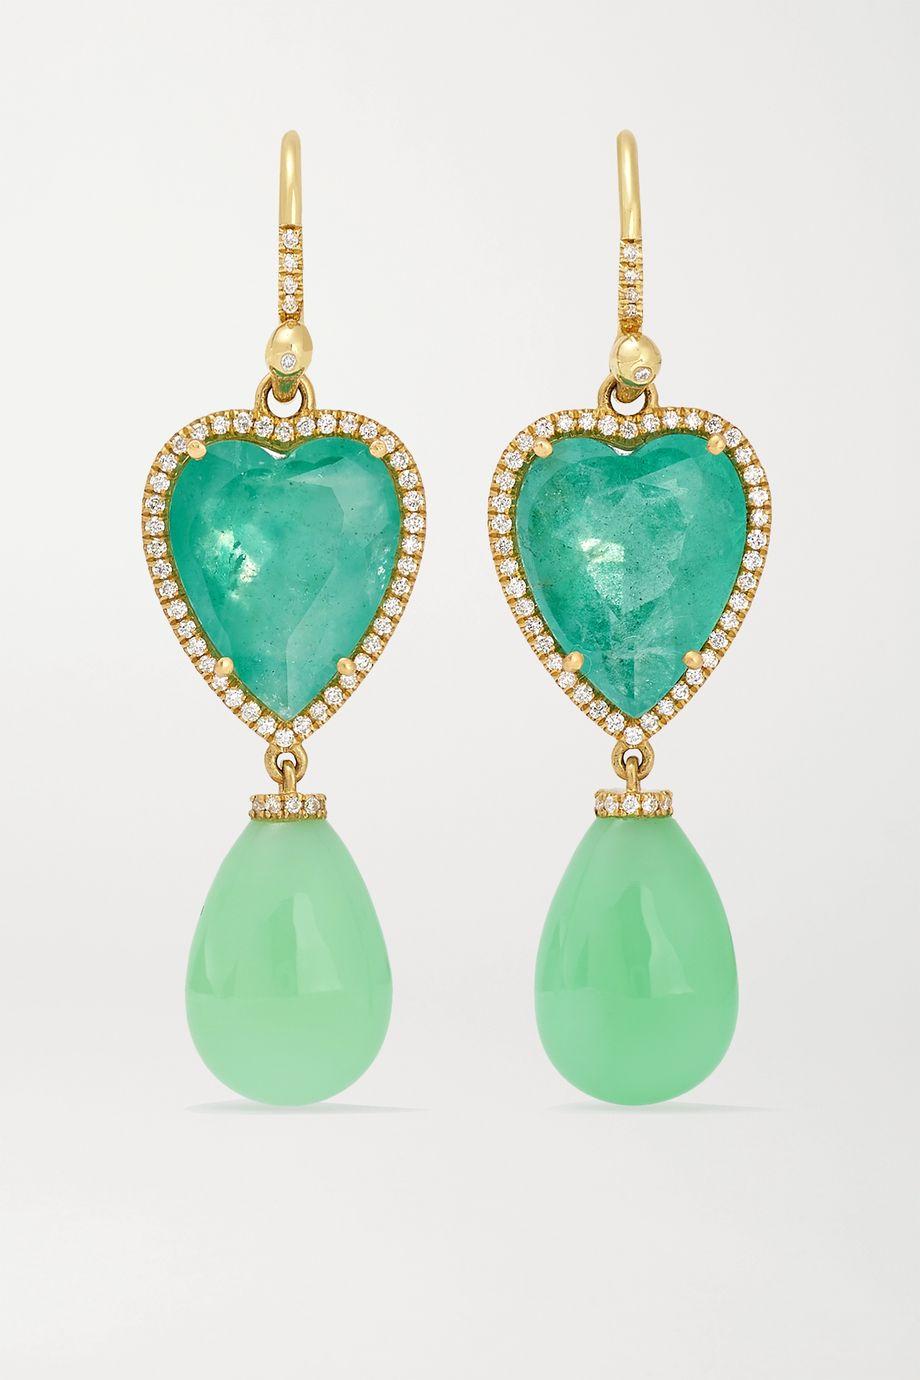 Irene Neuwirth 18-karat gold multi-stone earrings